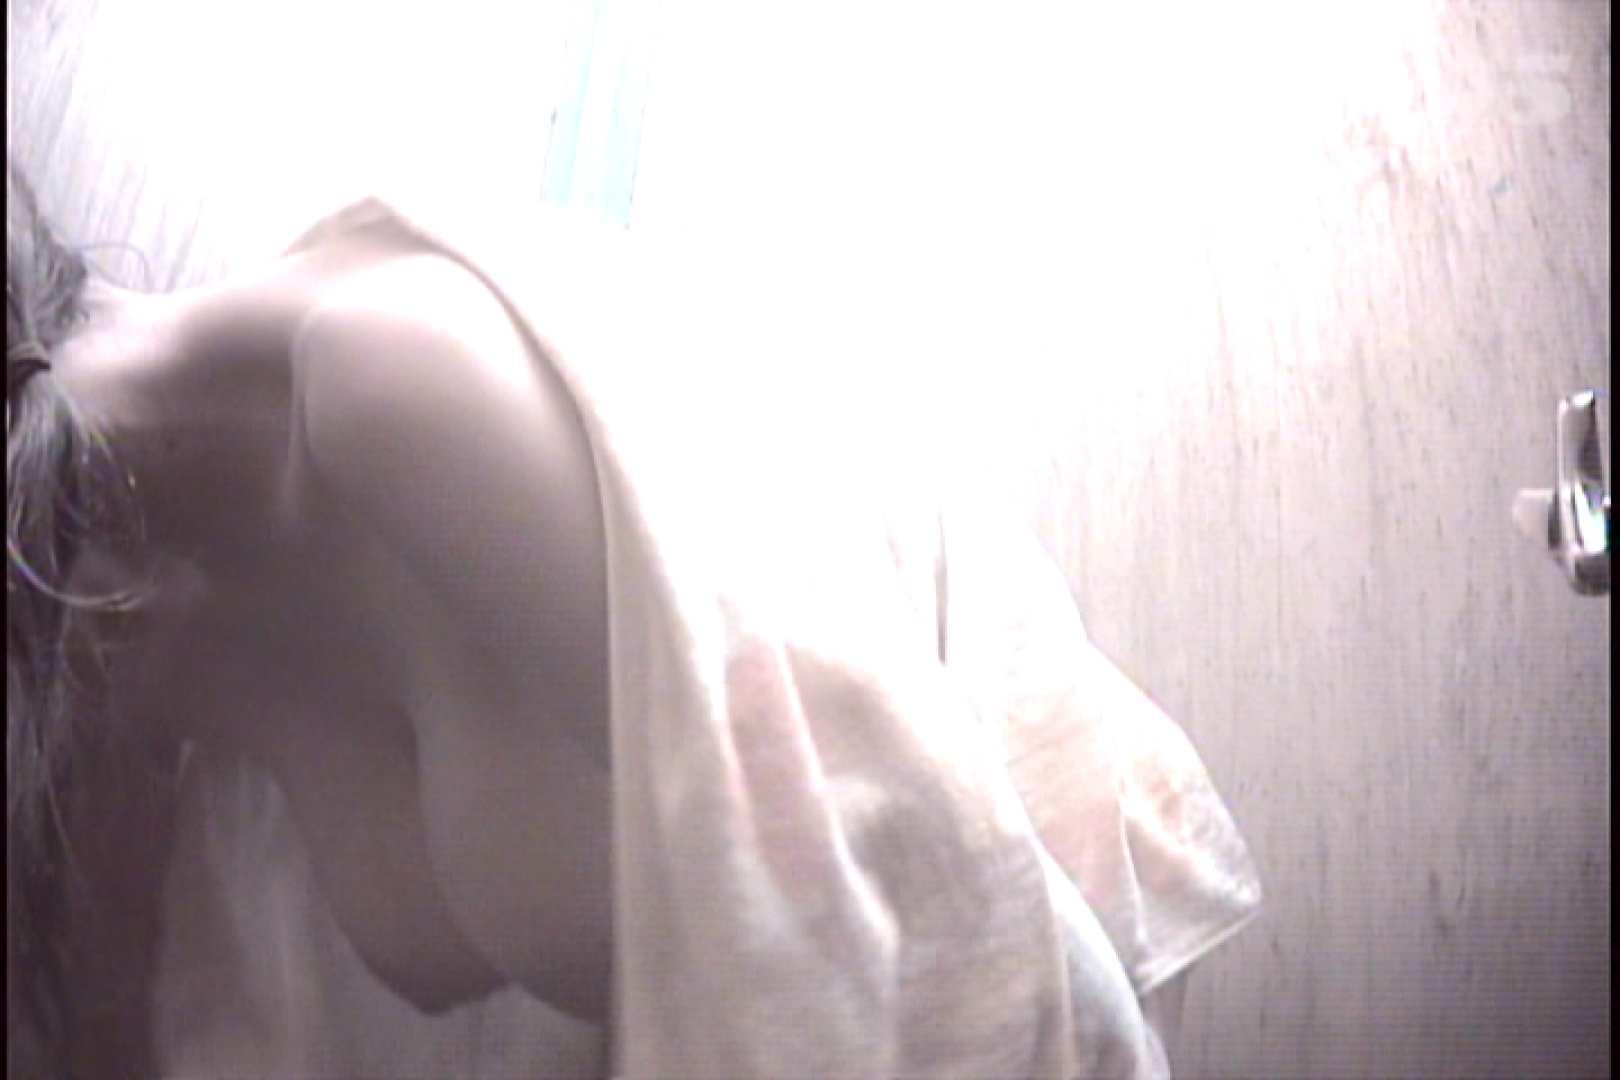 File.37 収穫の秋、こんなの取れました。必見です!【2011年20位】 脱衣所 アダルト動画キャプチャ 93連発 33